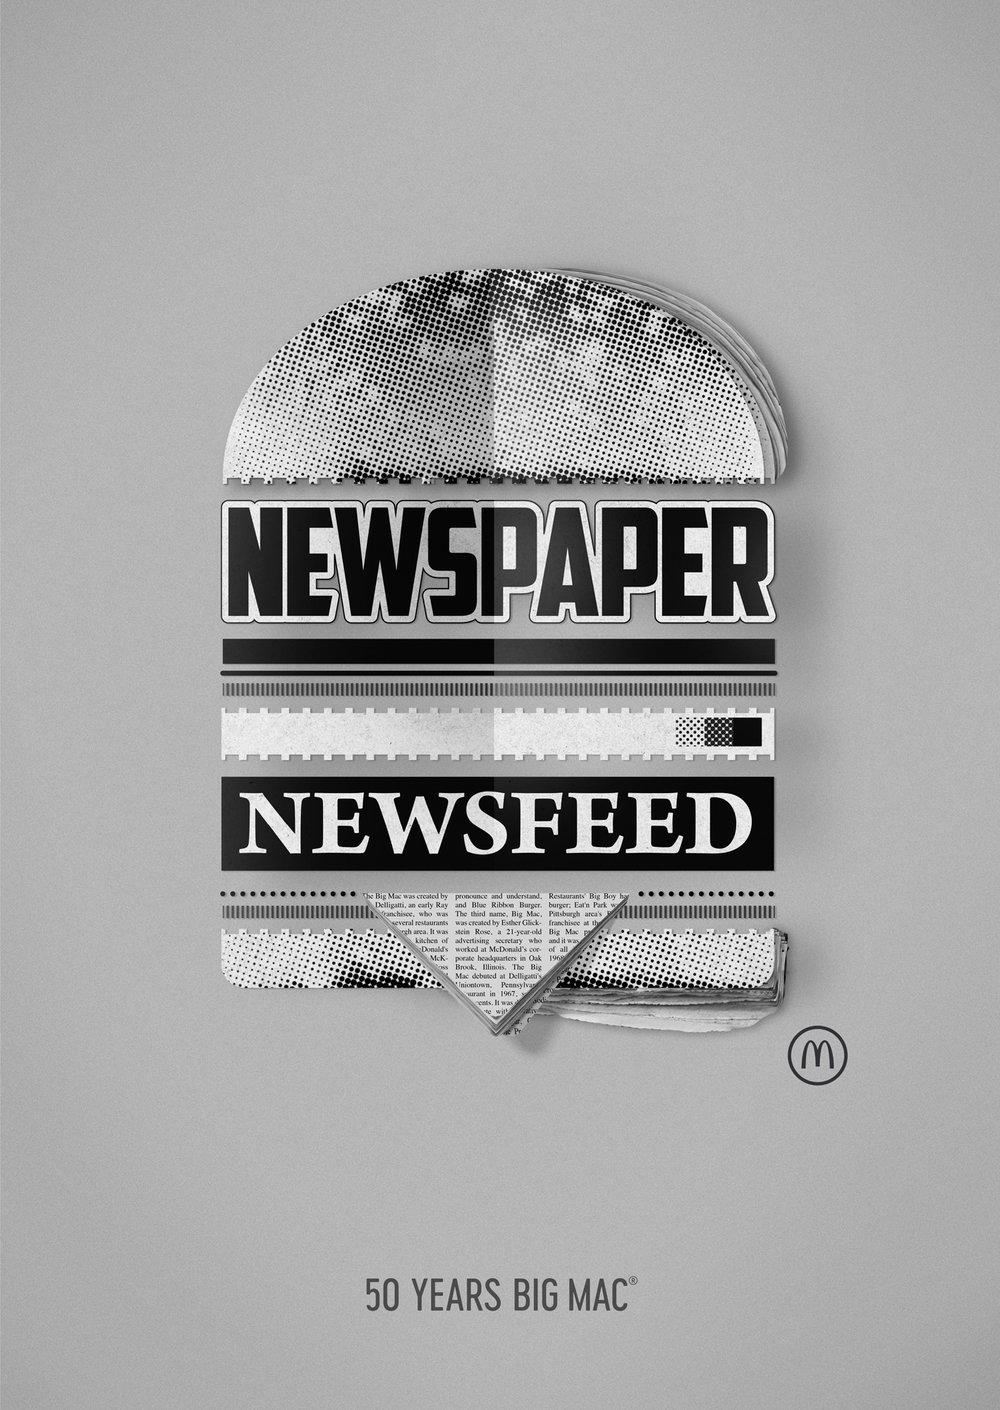 31_Newspaper_Newsfeed.jpg